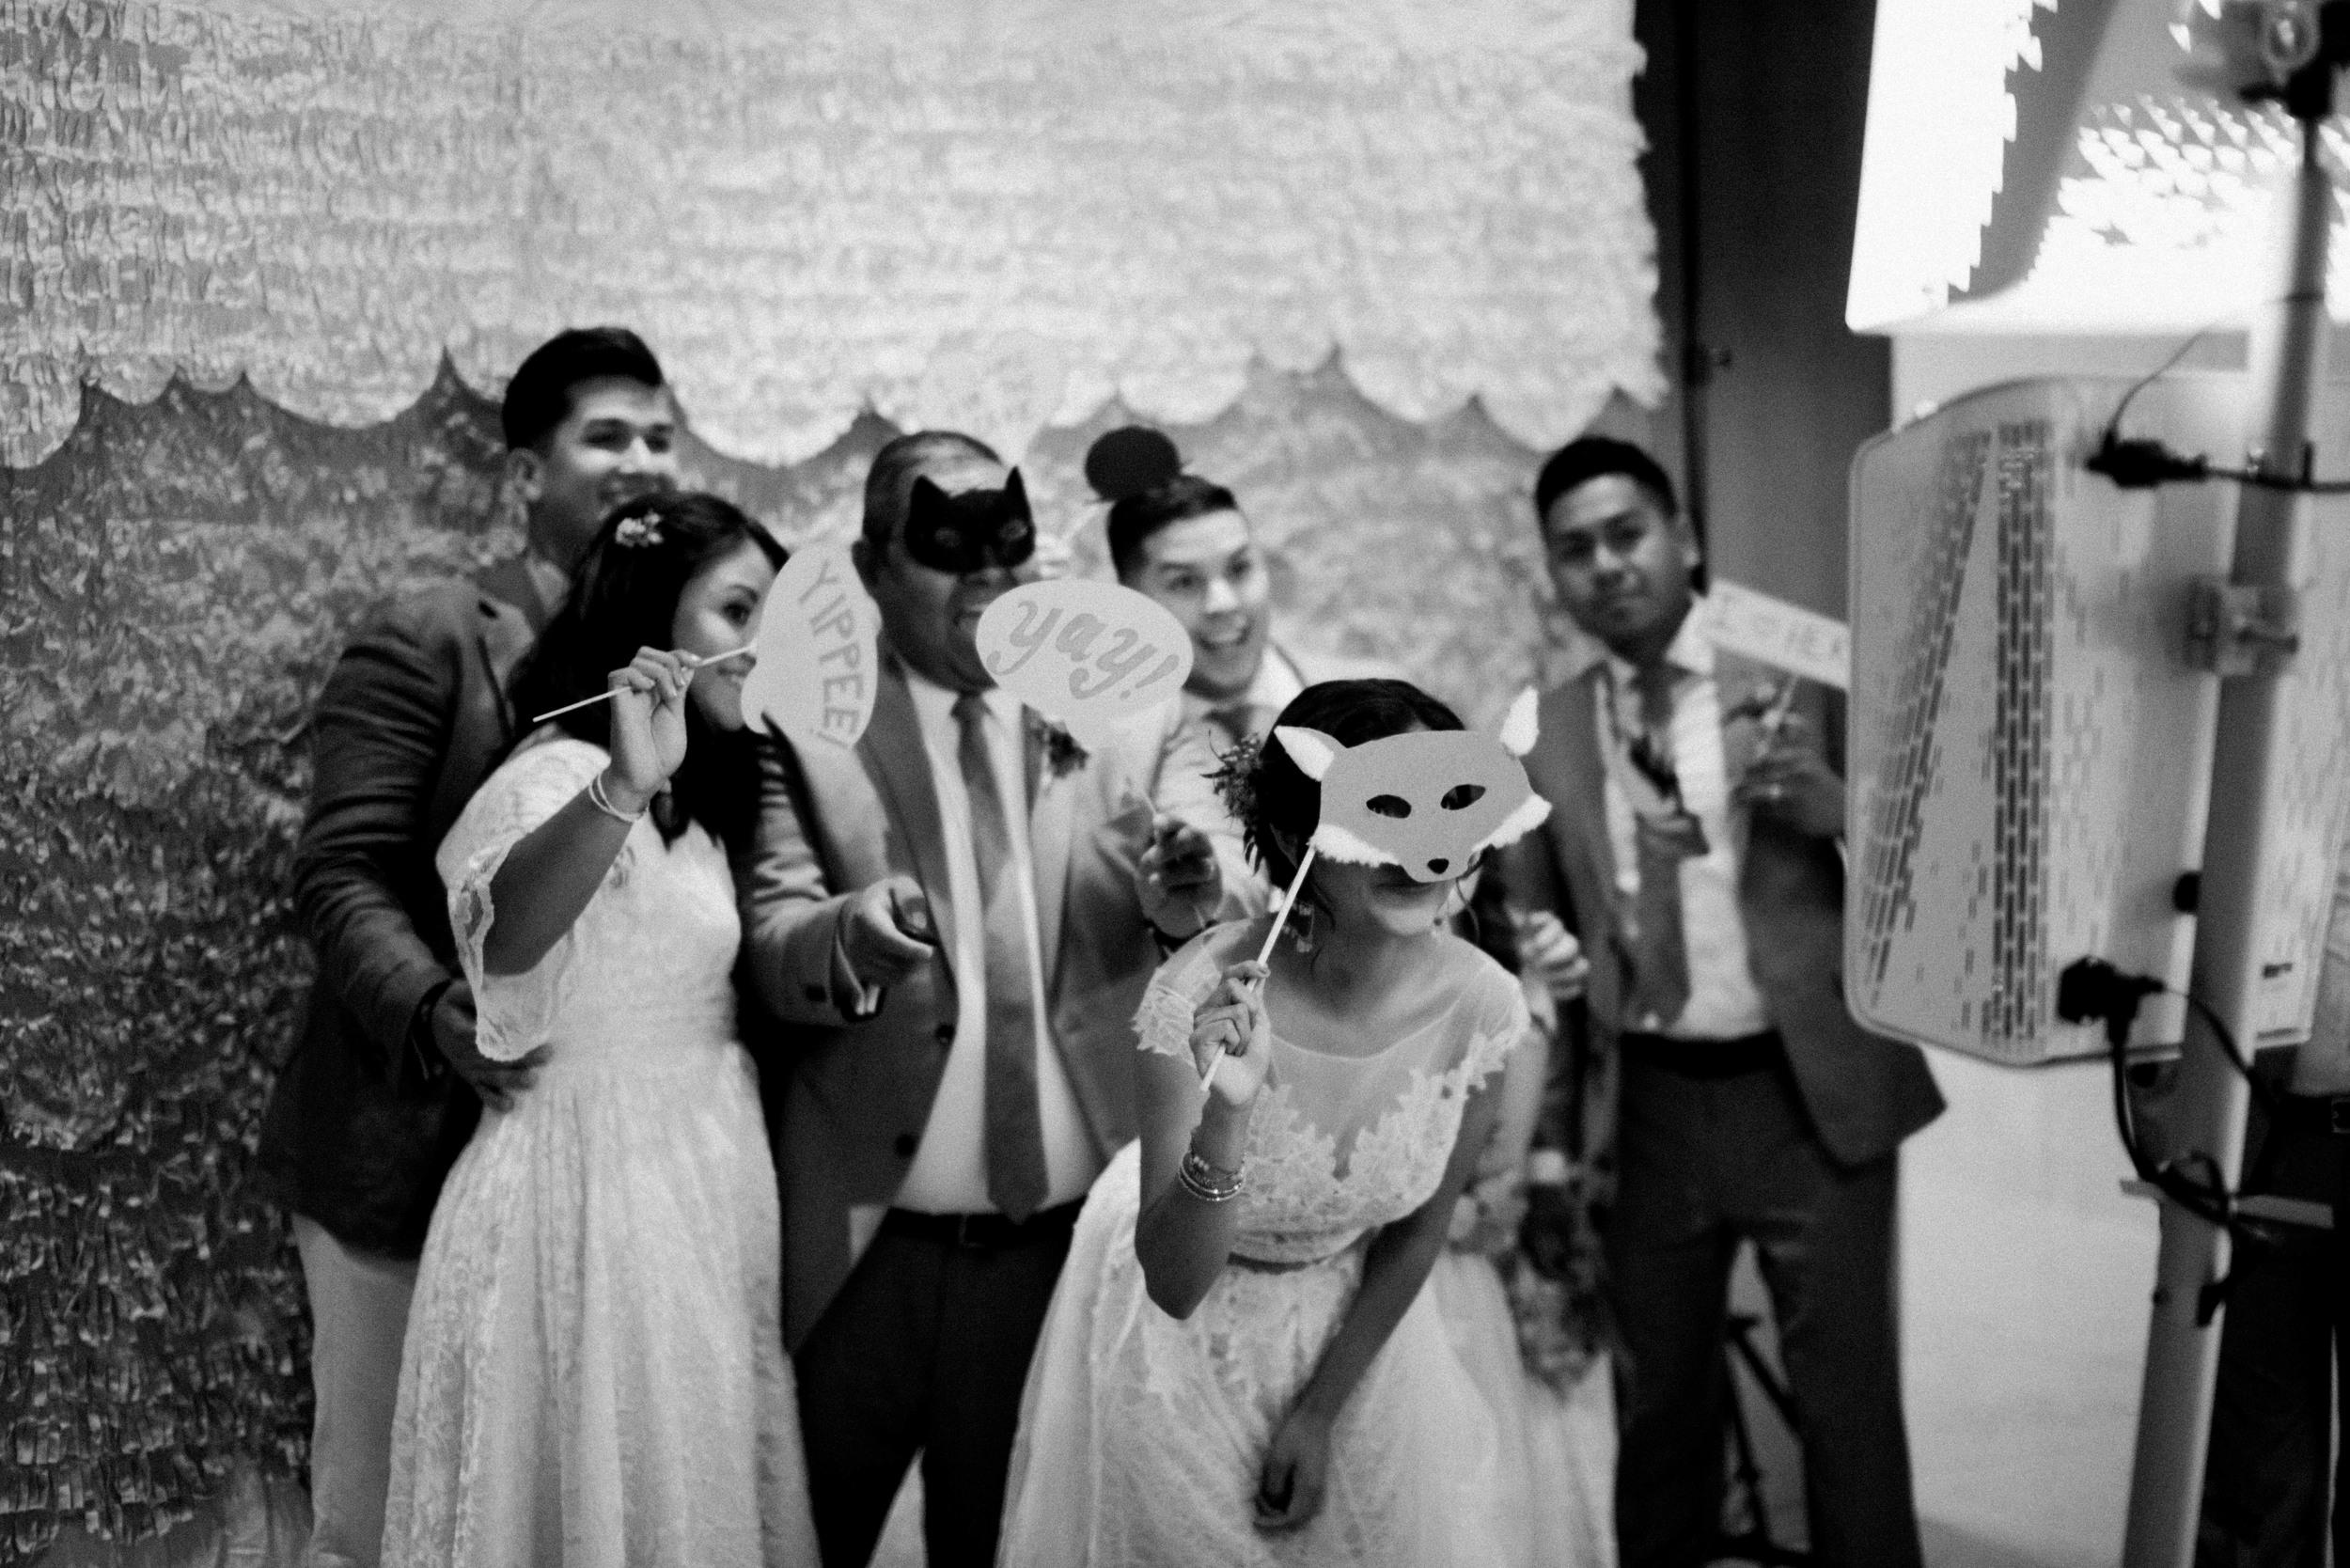 Dana-Fernandez-Photography-Martha-Stewart-Weddings-Houston-Texas-Wedding-Photographer-Film-39.jpg